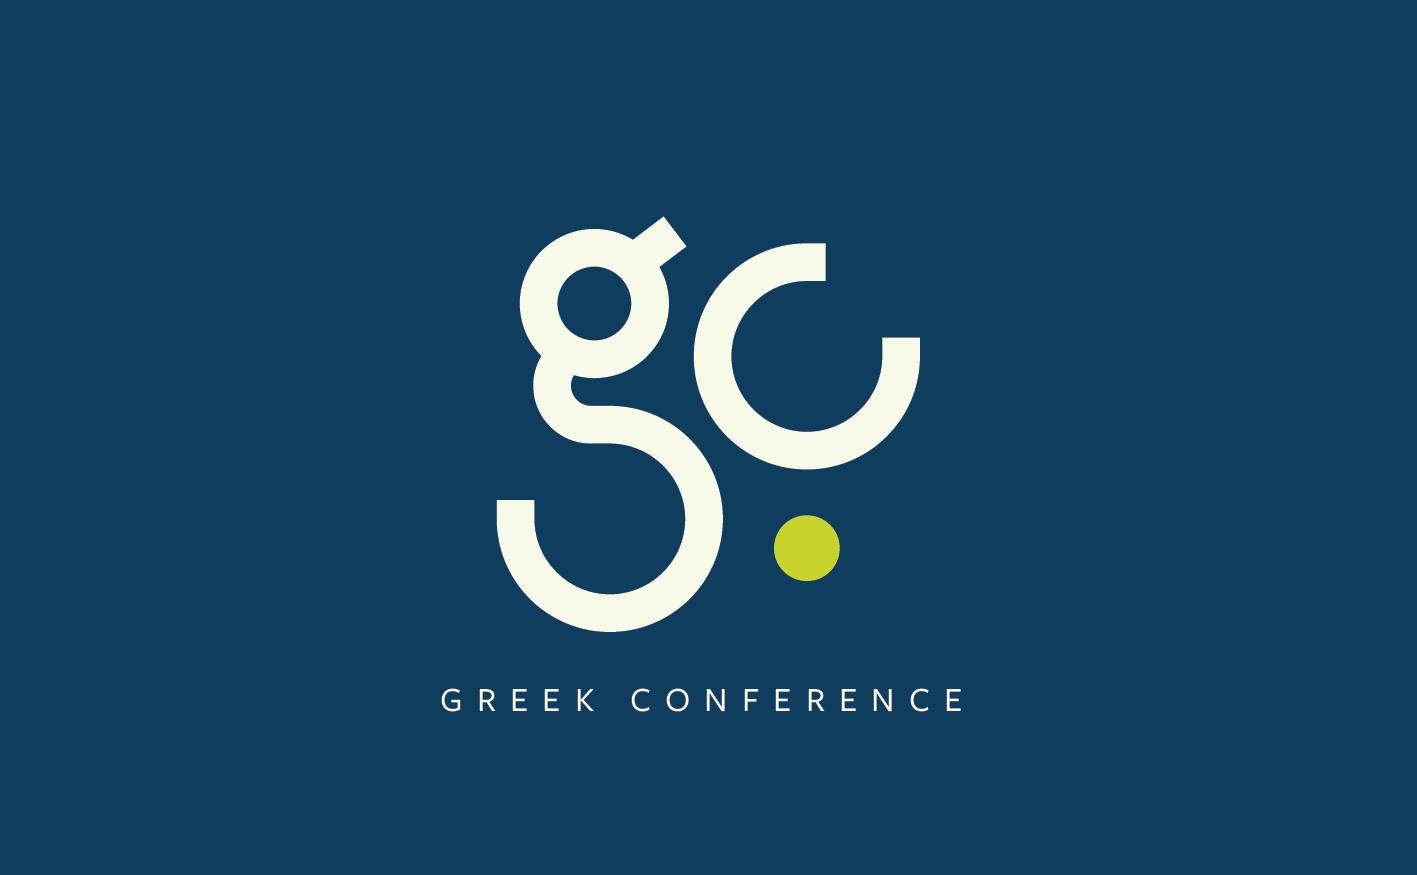 GreekConference-Website-420px-02